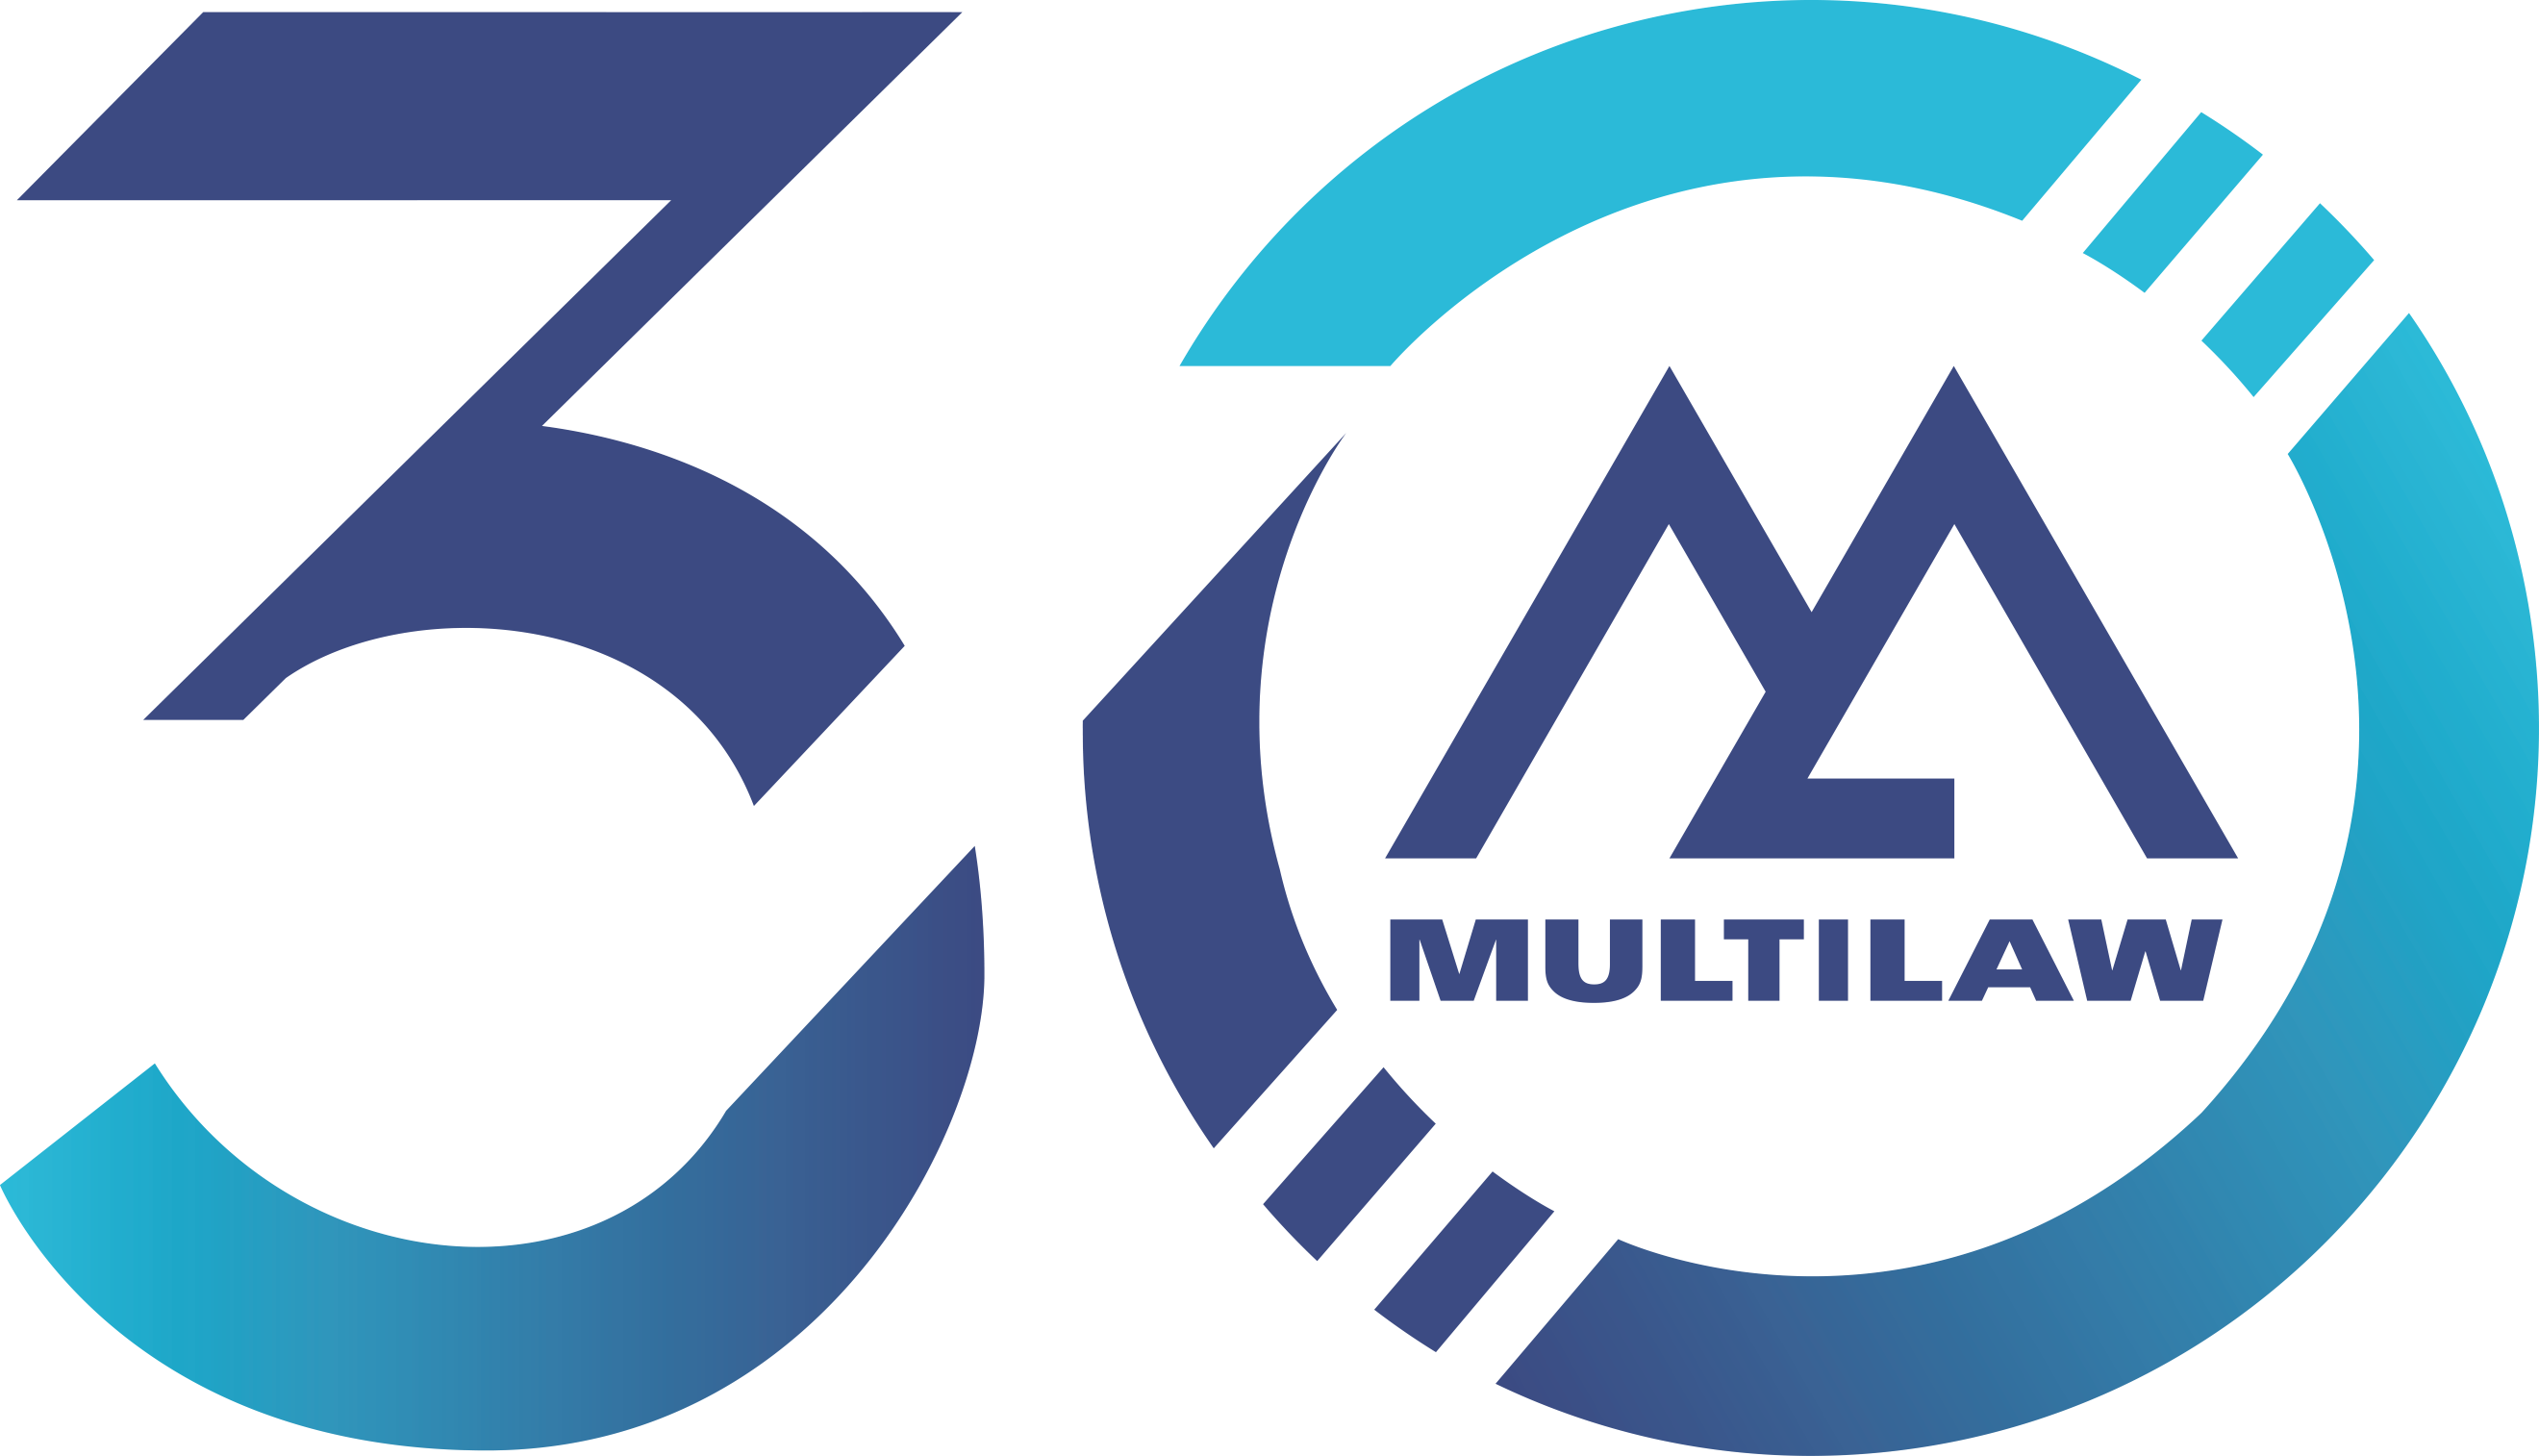 Multilaw internationale advokater